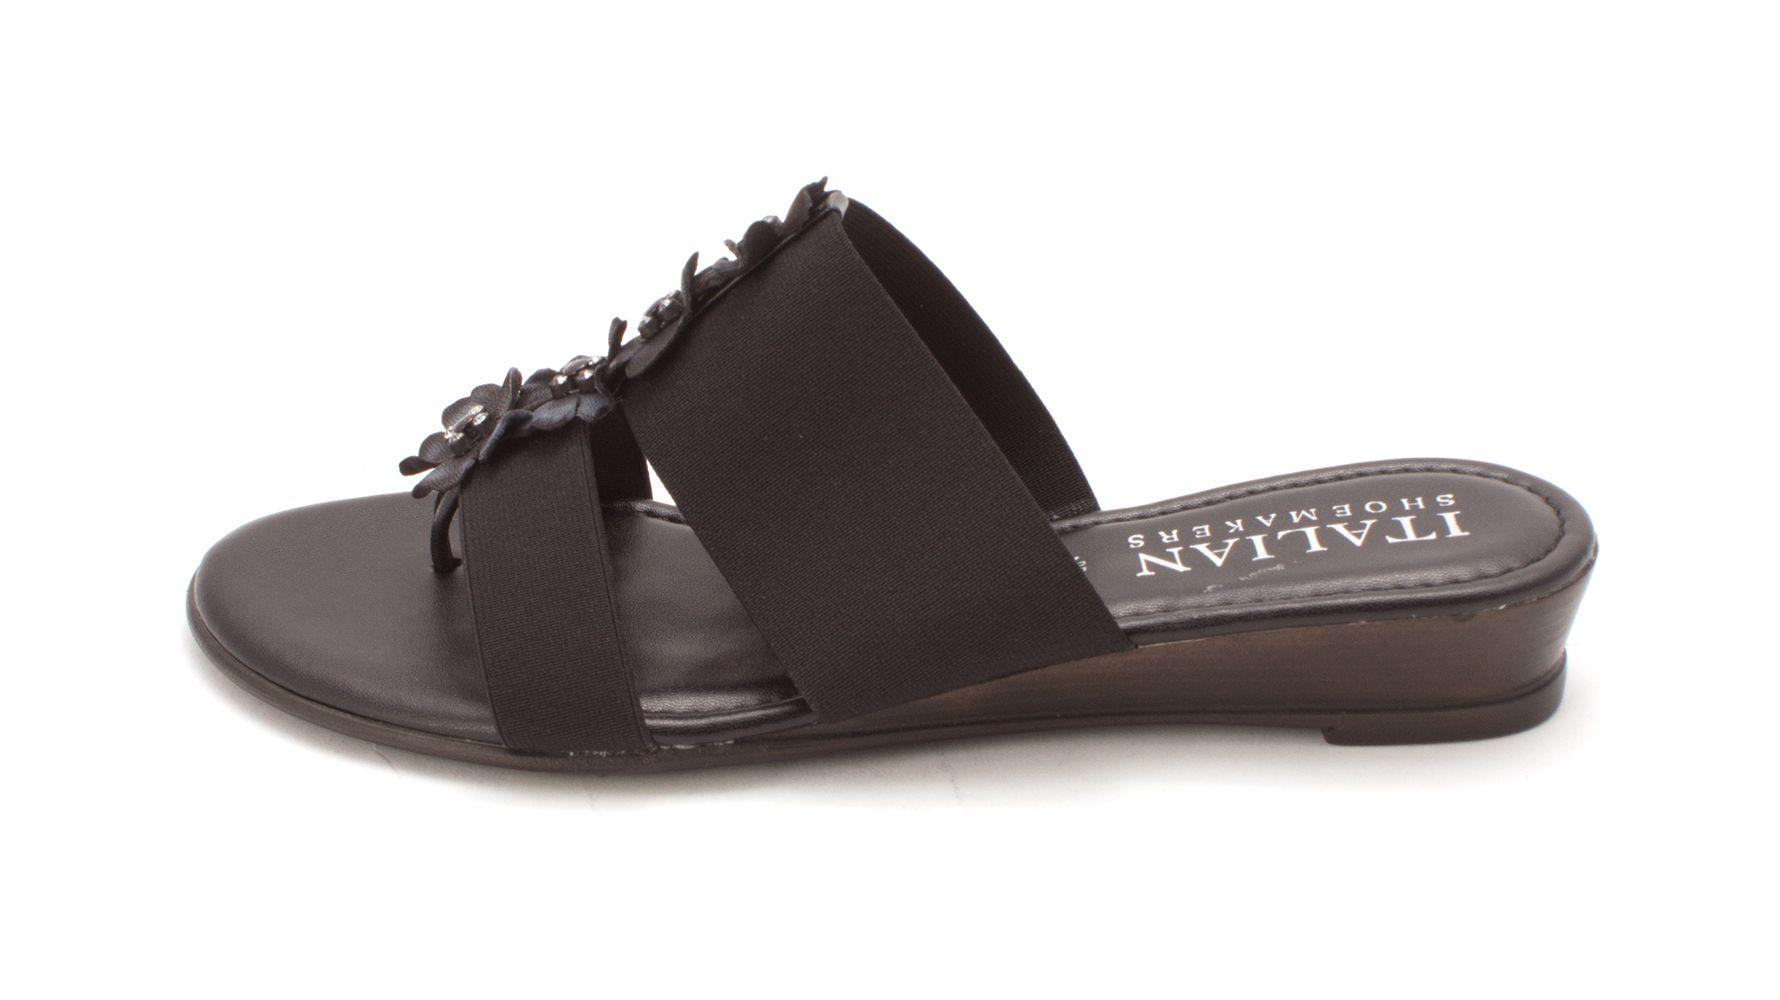 265e4fb3984 Lyst - Italian Shoemakers Womens Greta L Open Toe Casual Slide ...